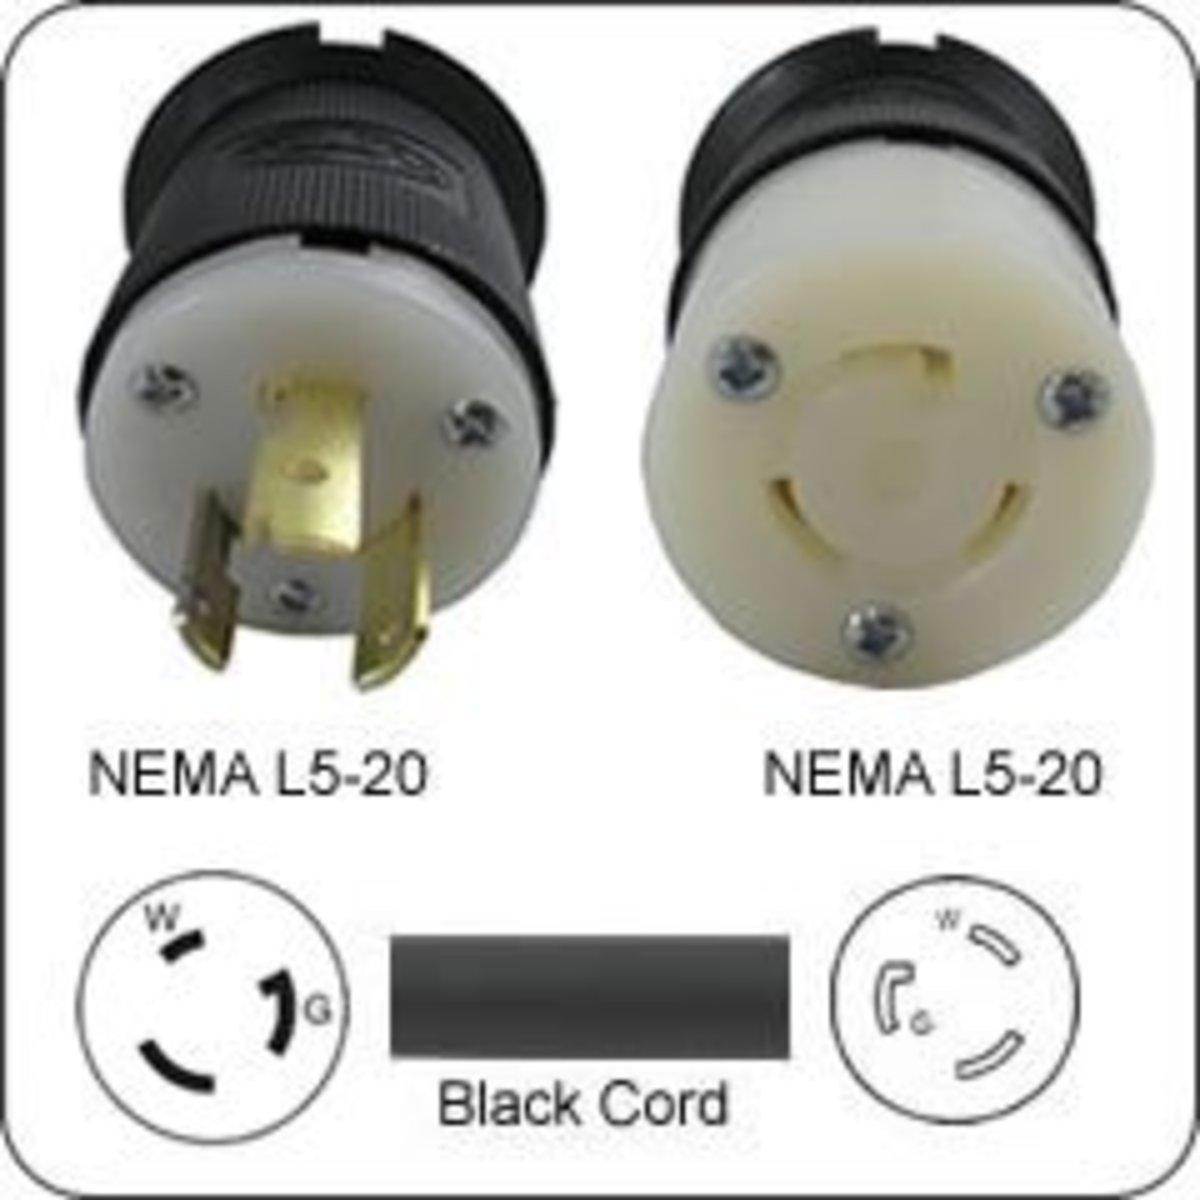 IMAGE 5: Twist Lock Connection